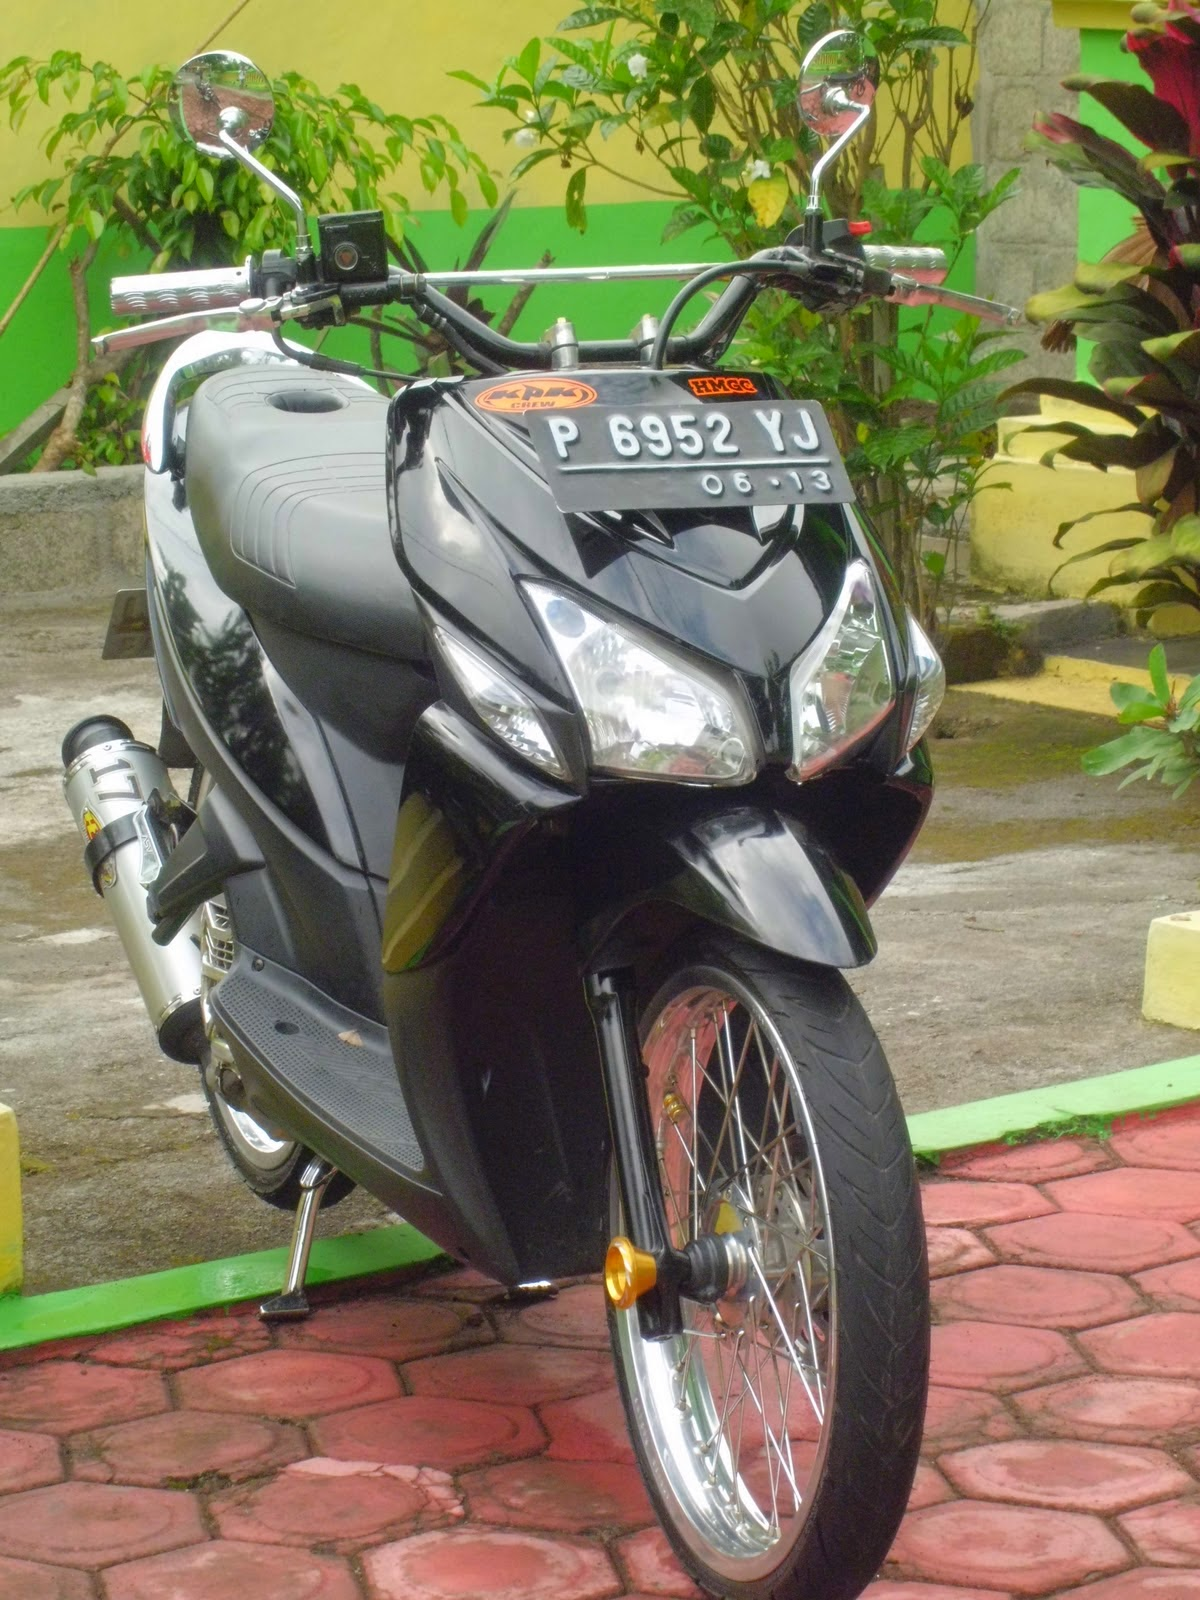 98 Modifikasi Motor Vario 125 Velg Lebar Terbaru Oneng Motomania